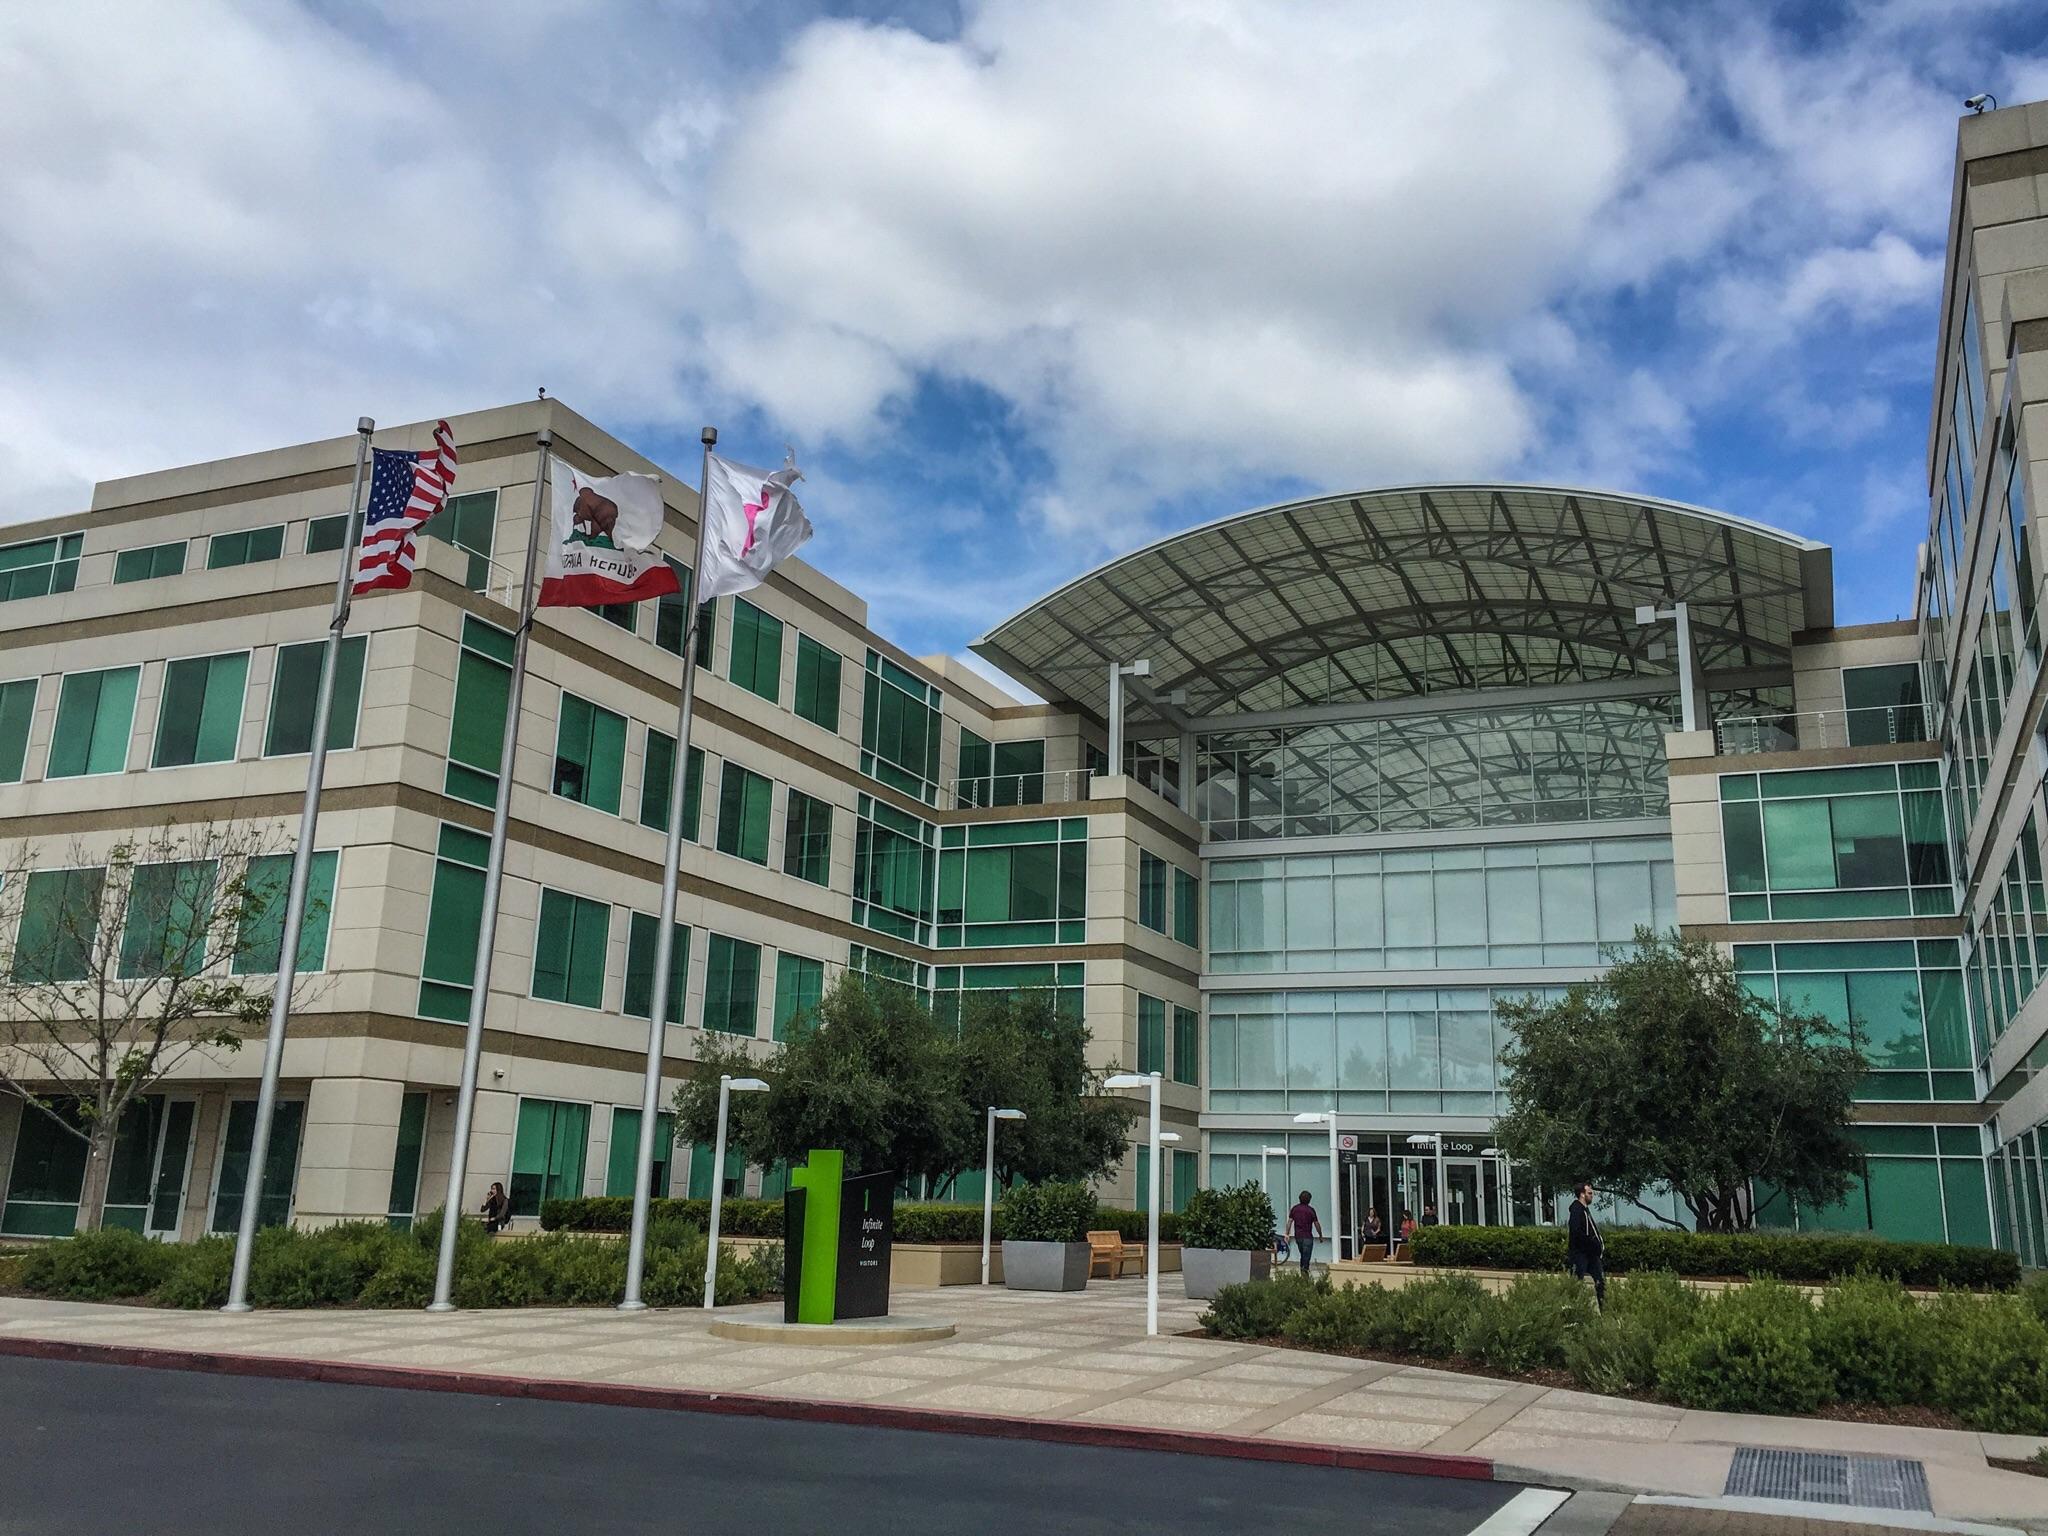 Cupertino - Apple world headquarters